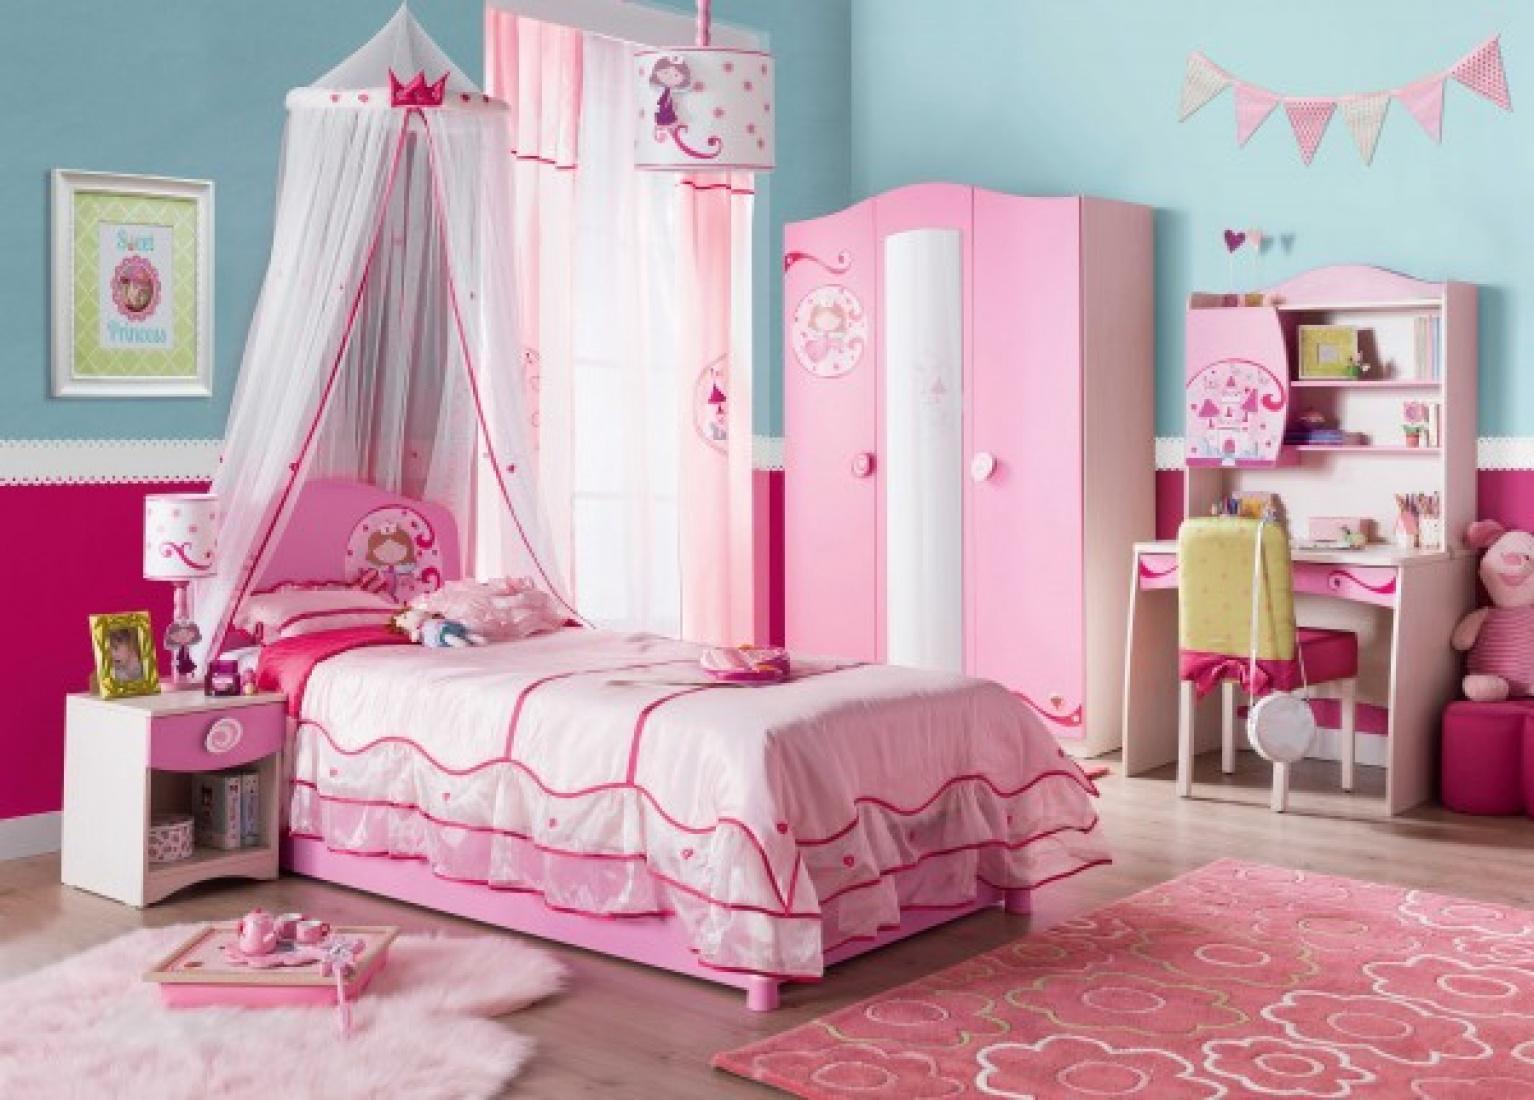 Cilek Princess Kinderzimmer 4-teilig Rosa